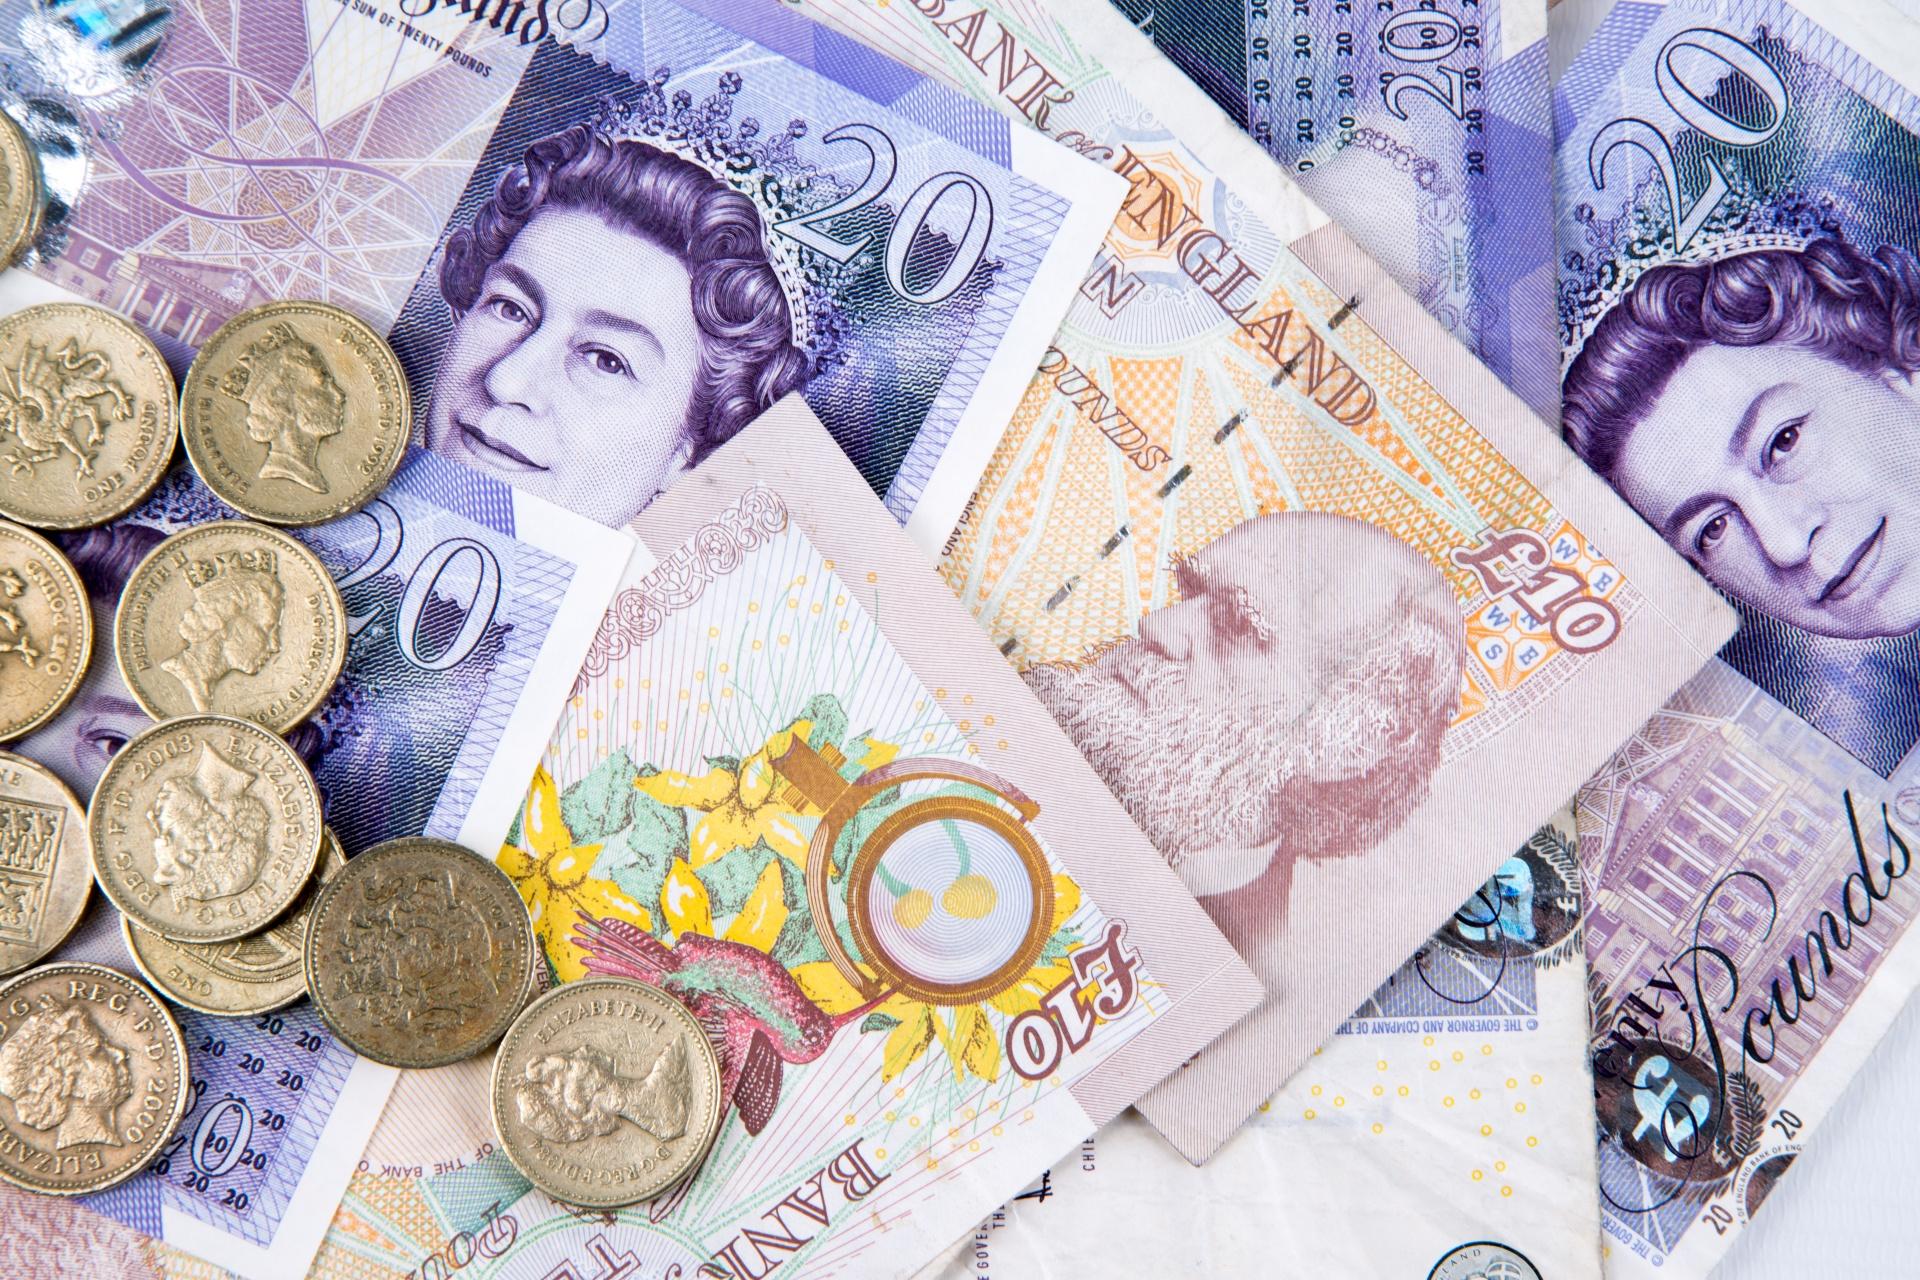 money-1462205099xET